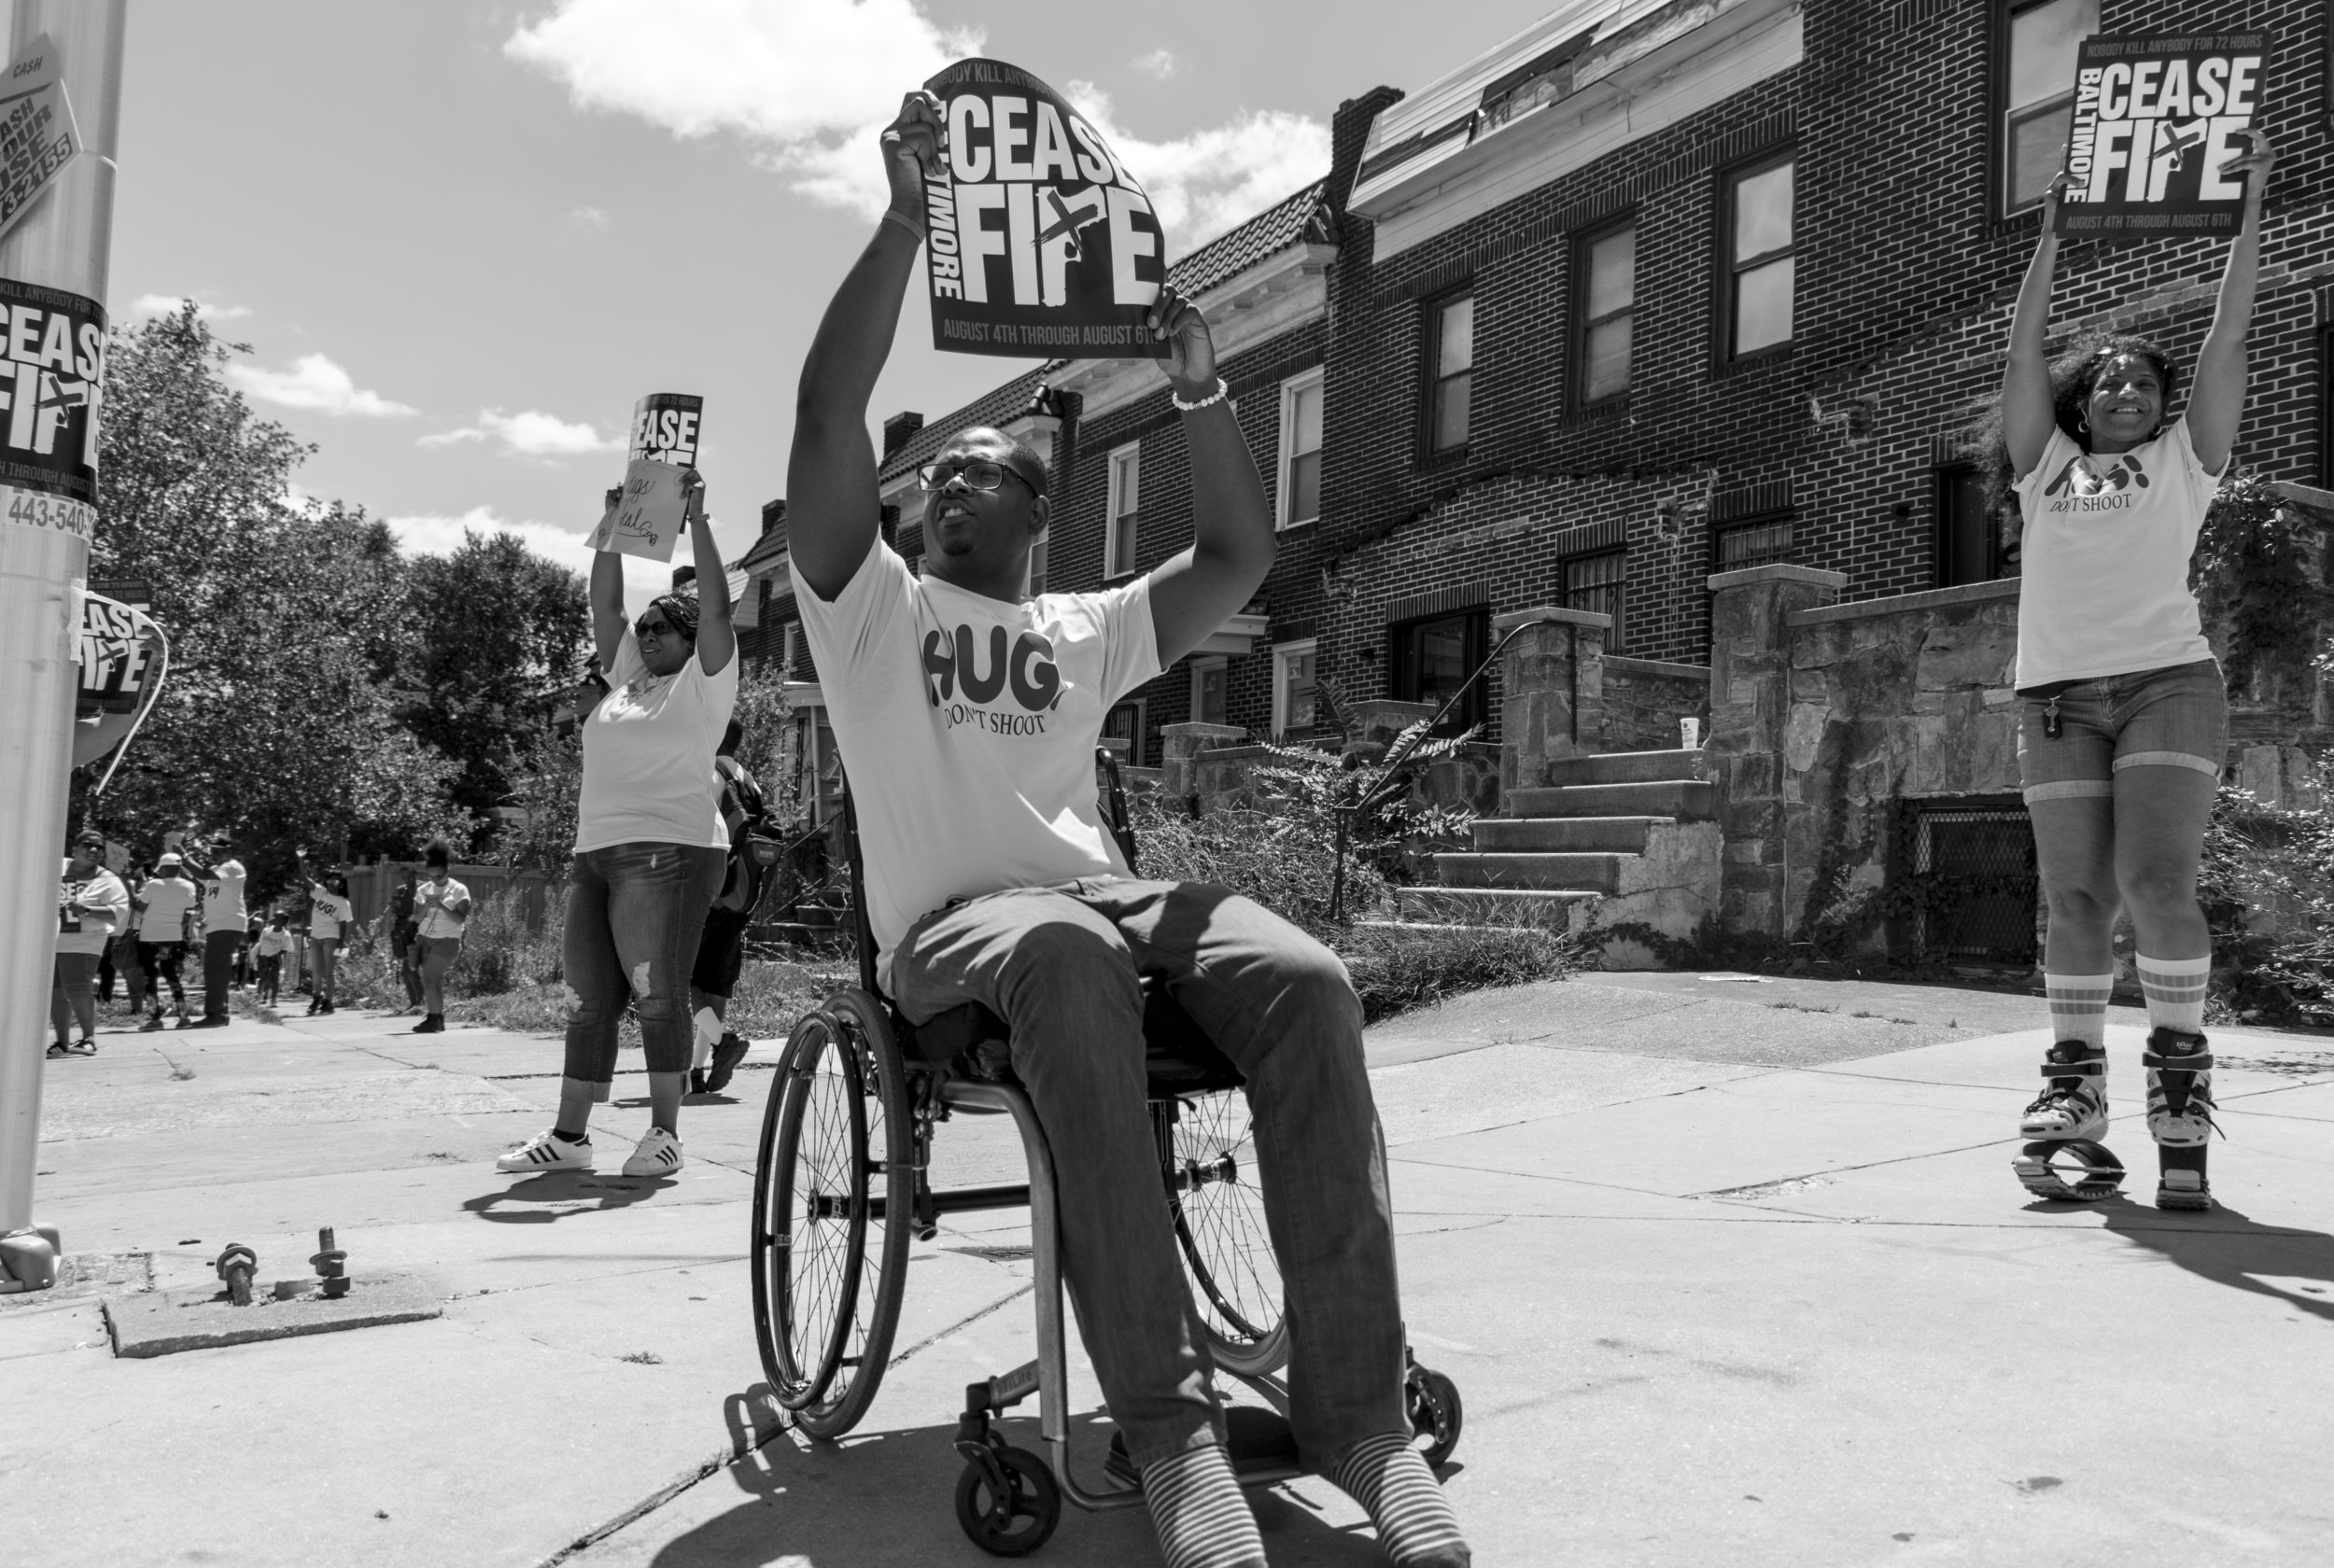 BaltimoreCeasefire2017_Lai_010.JPG